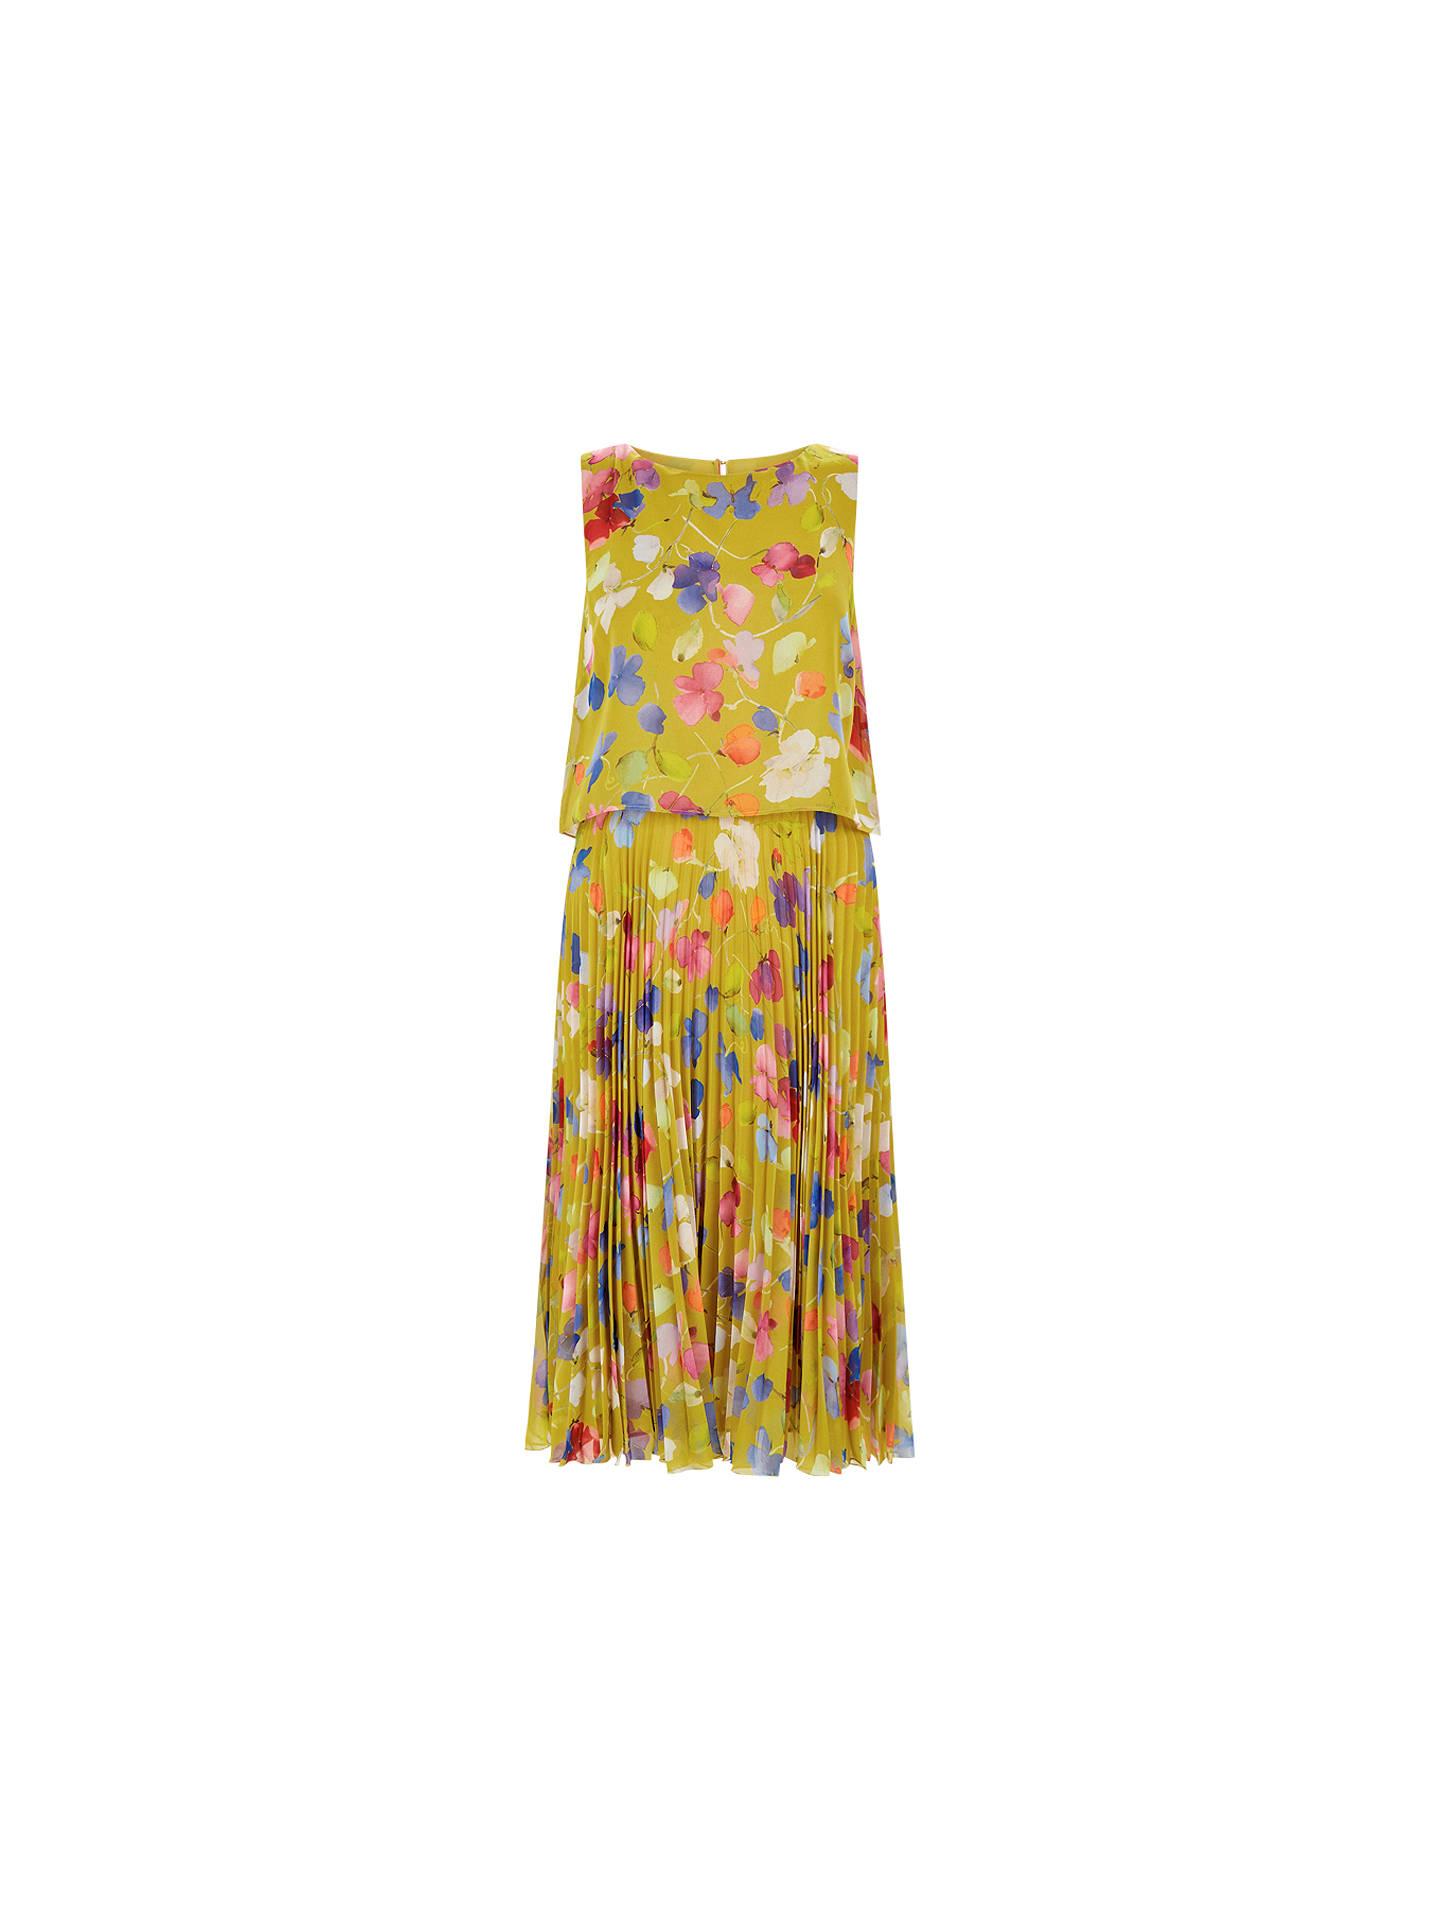 reasonably priced hot products fantastic savings Hobbs Tabitha Dress, Zest Green at John Lewis & Partners